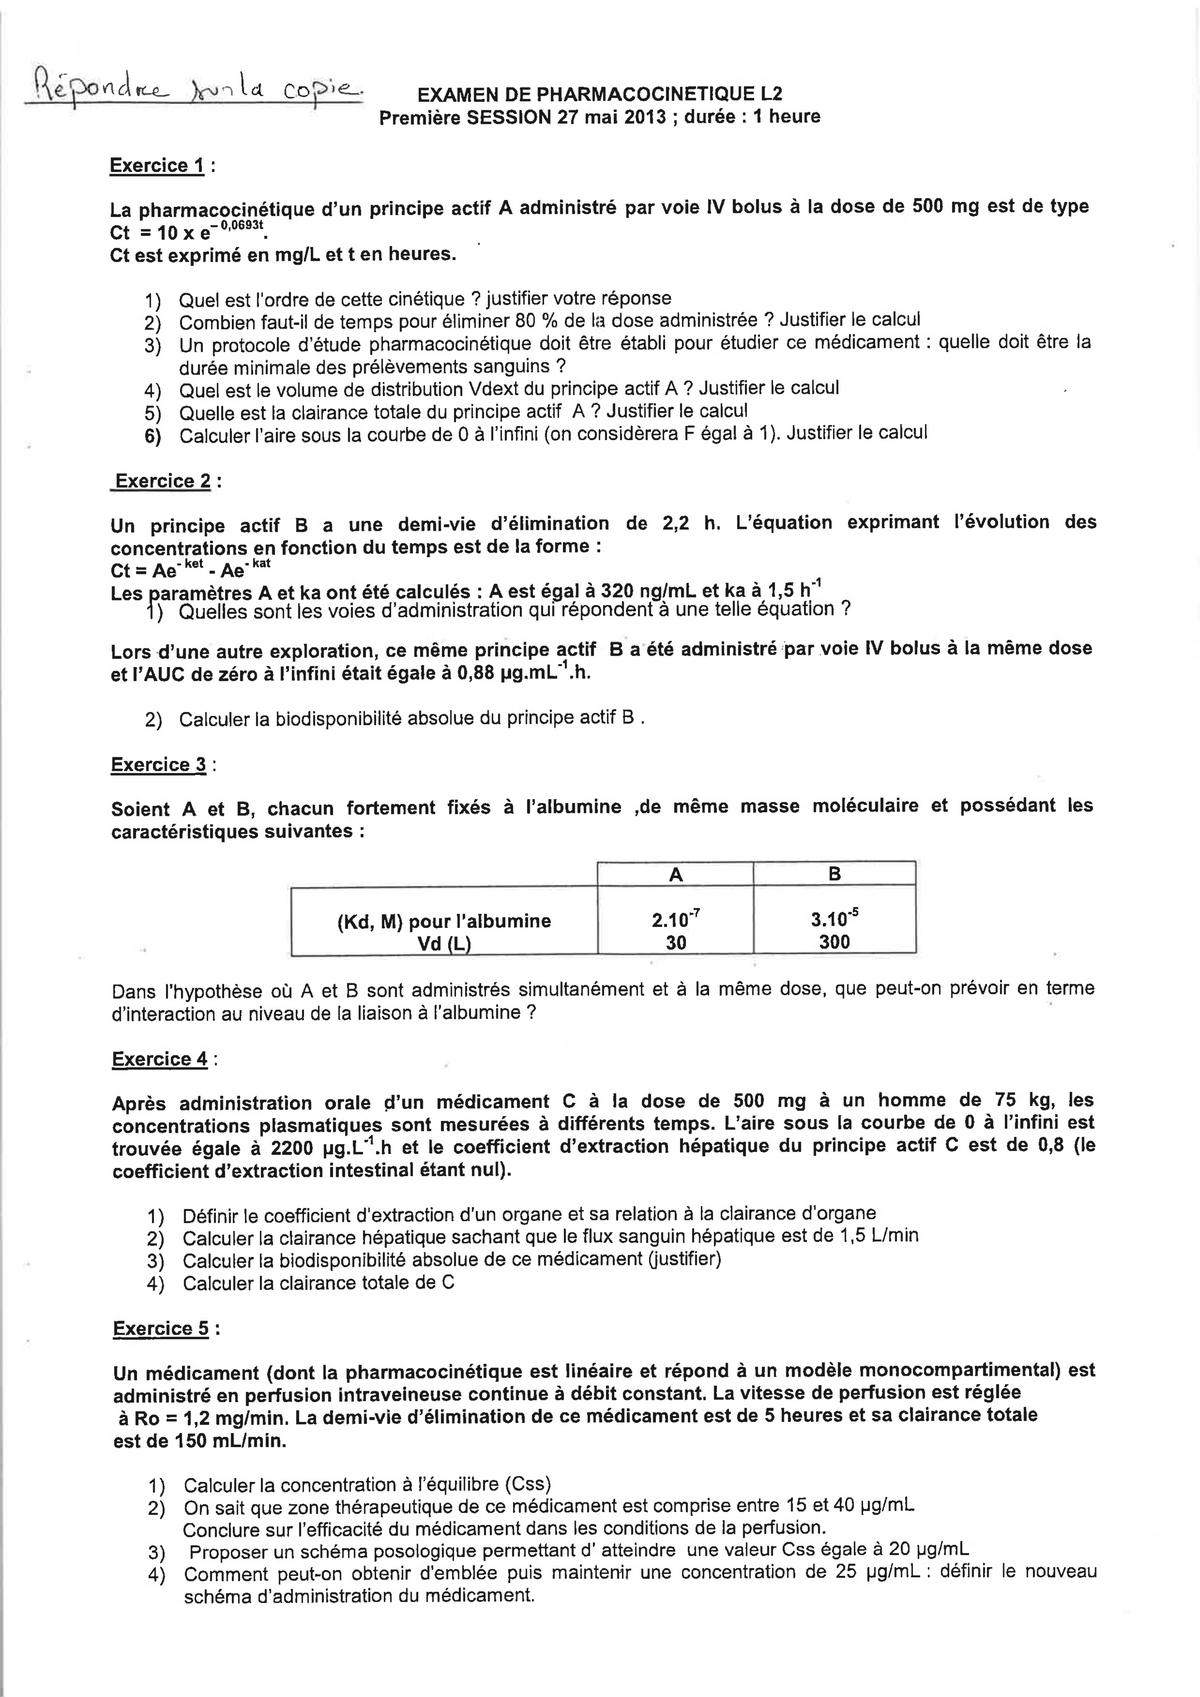 Examen 27 Mai 2013 Questions Sciences Pharmacologiques Studocu